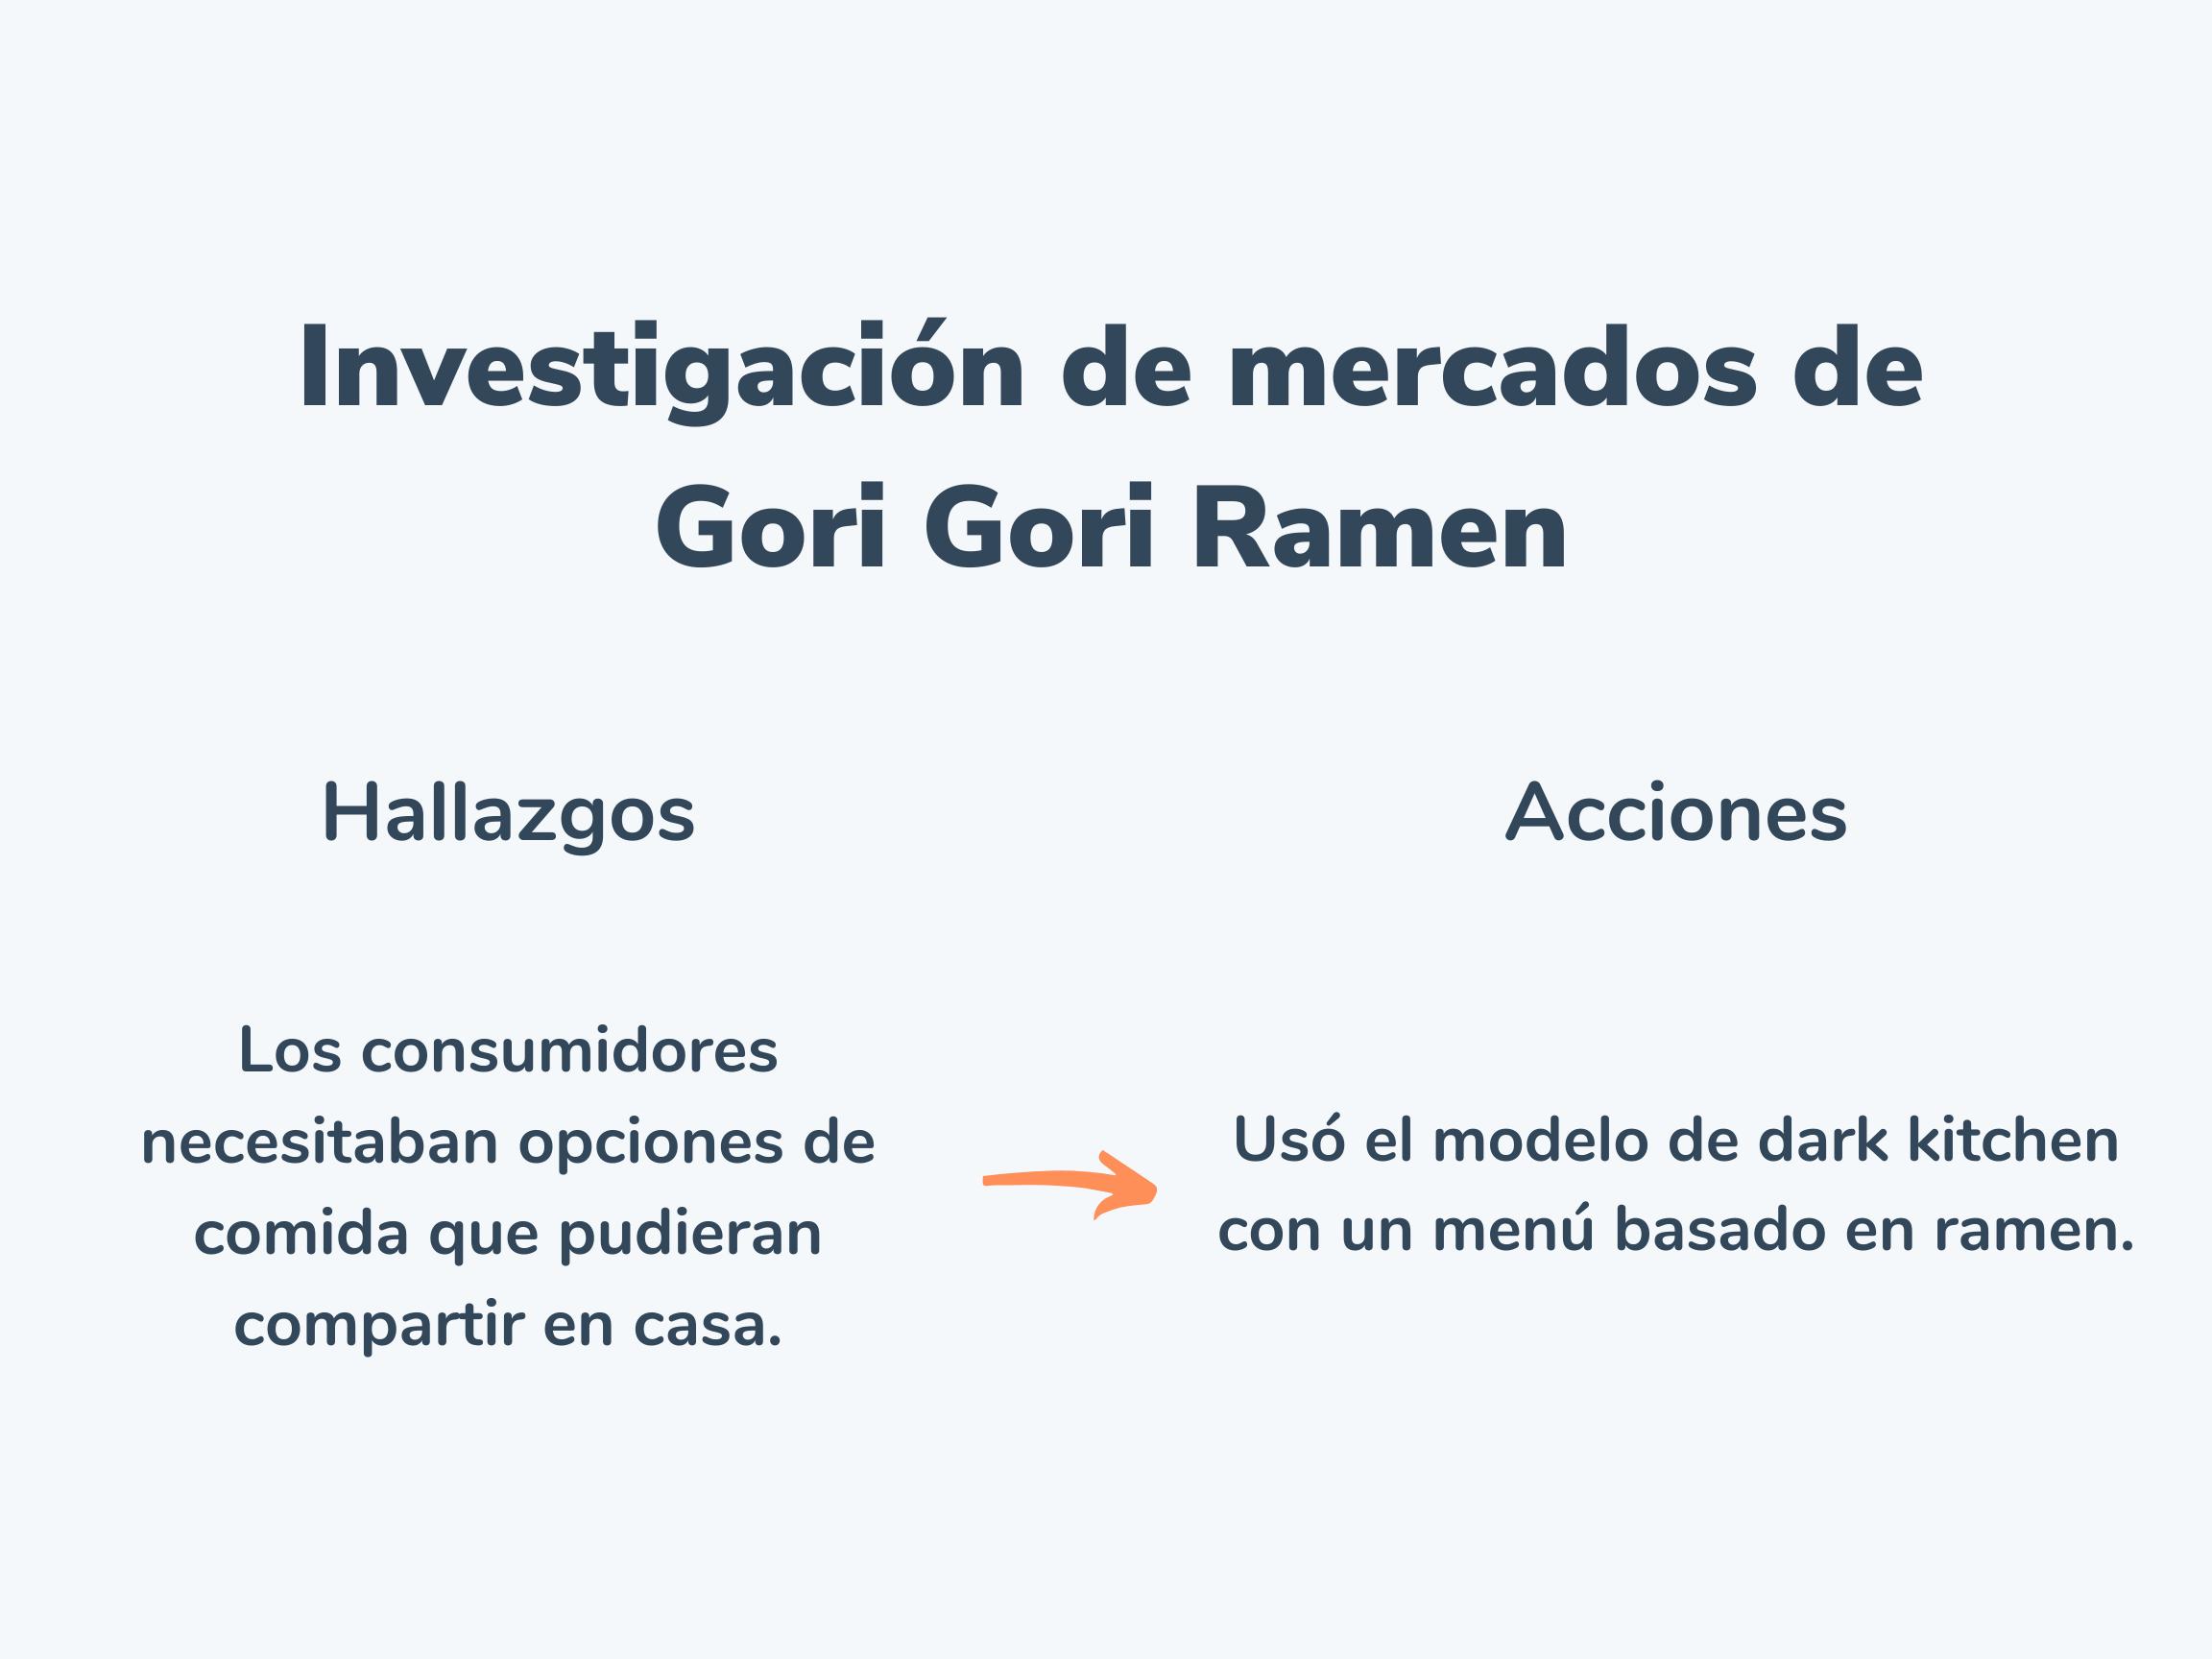 Ejemplo de estudio de mercados de Gori Gori Ramen